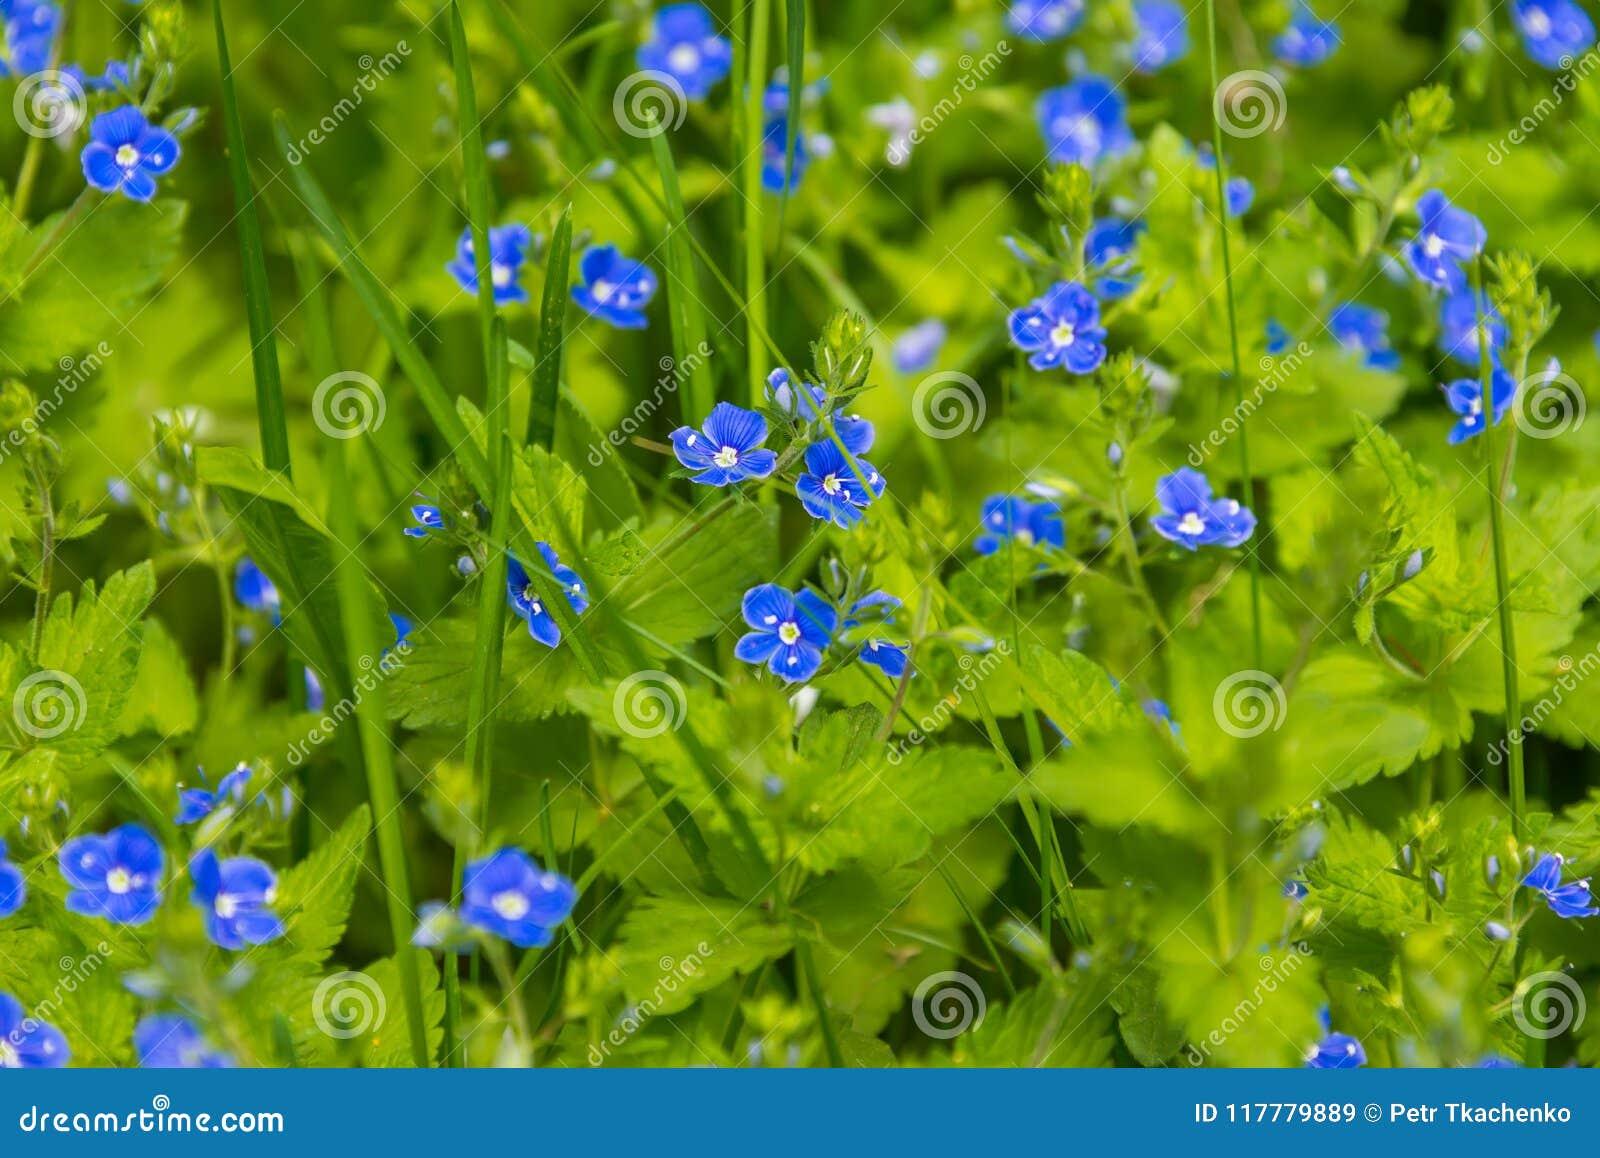 field of blue flowers cornflowers stock image image of closeup